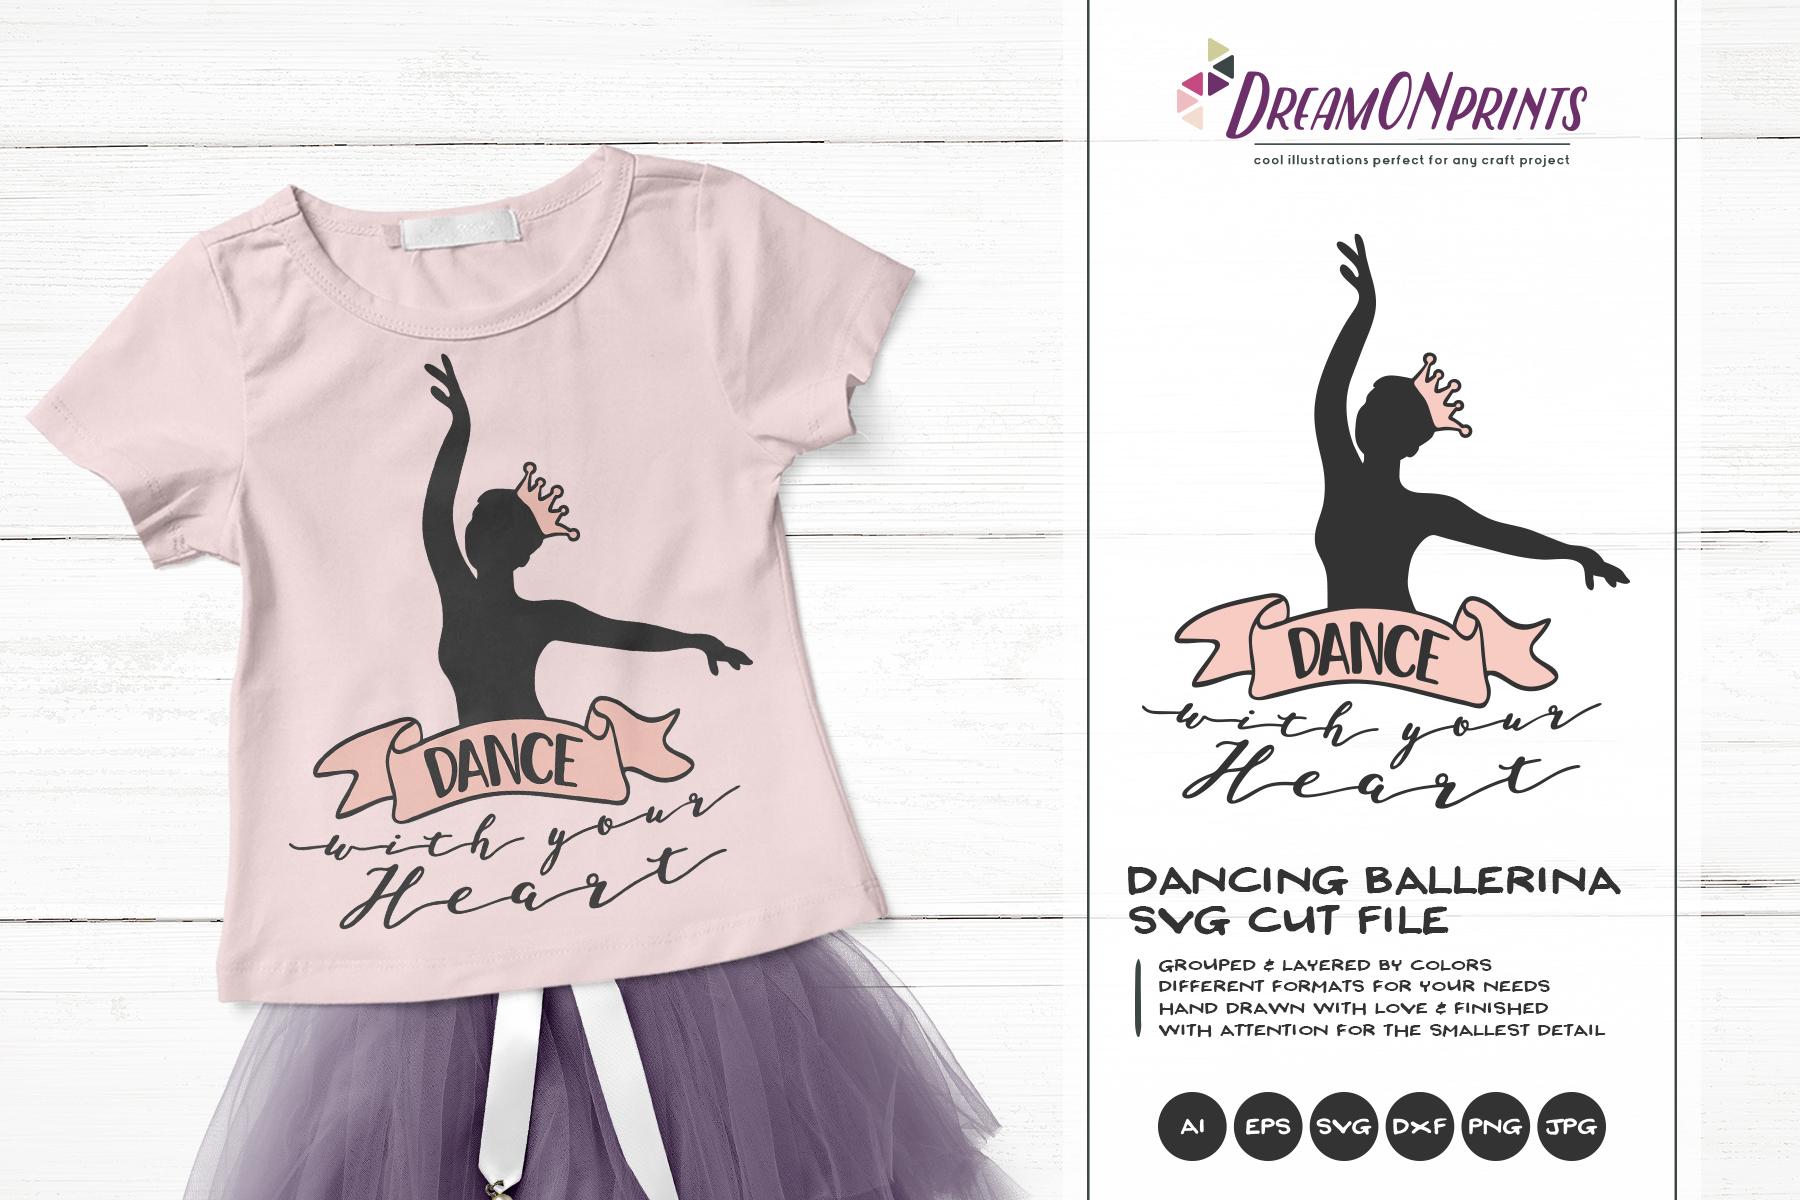 Dance with Your Heart |Ballerina SVG | Ballet Dancer example image 1